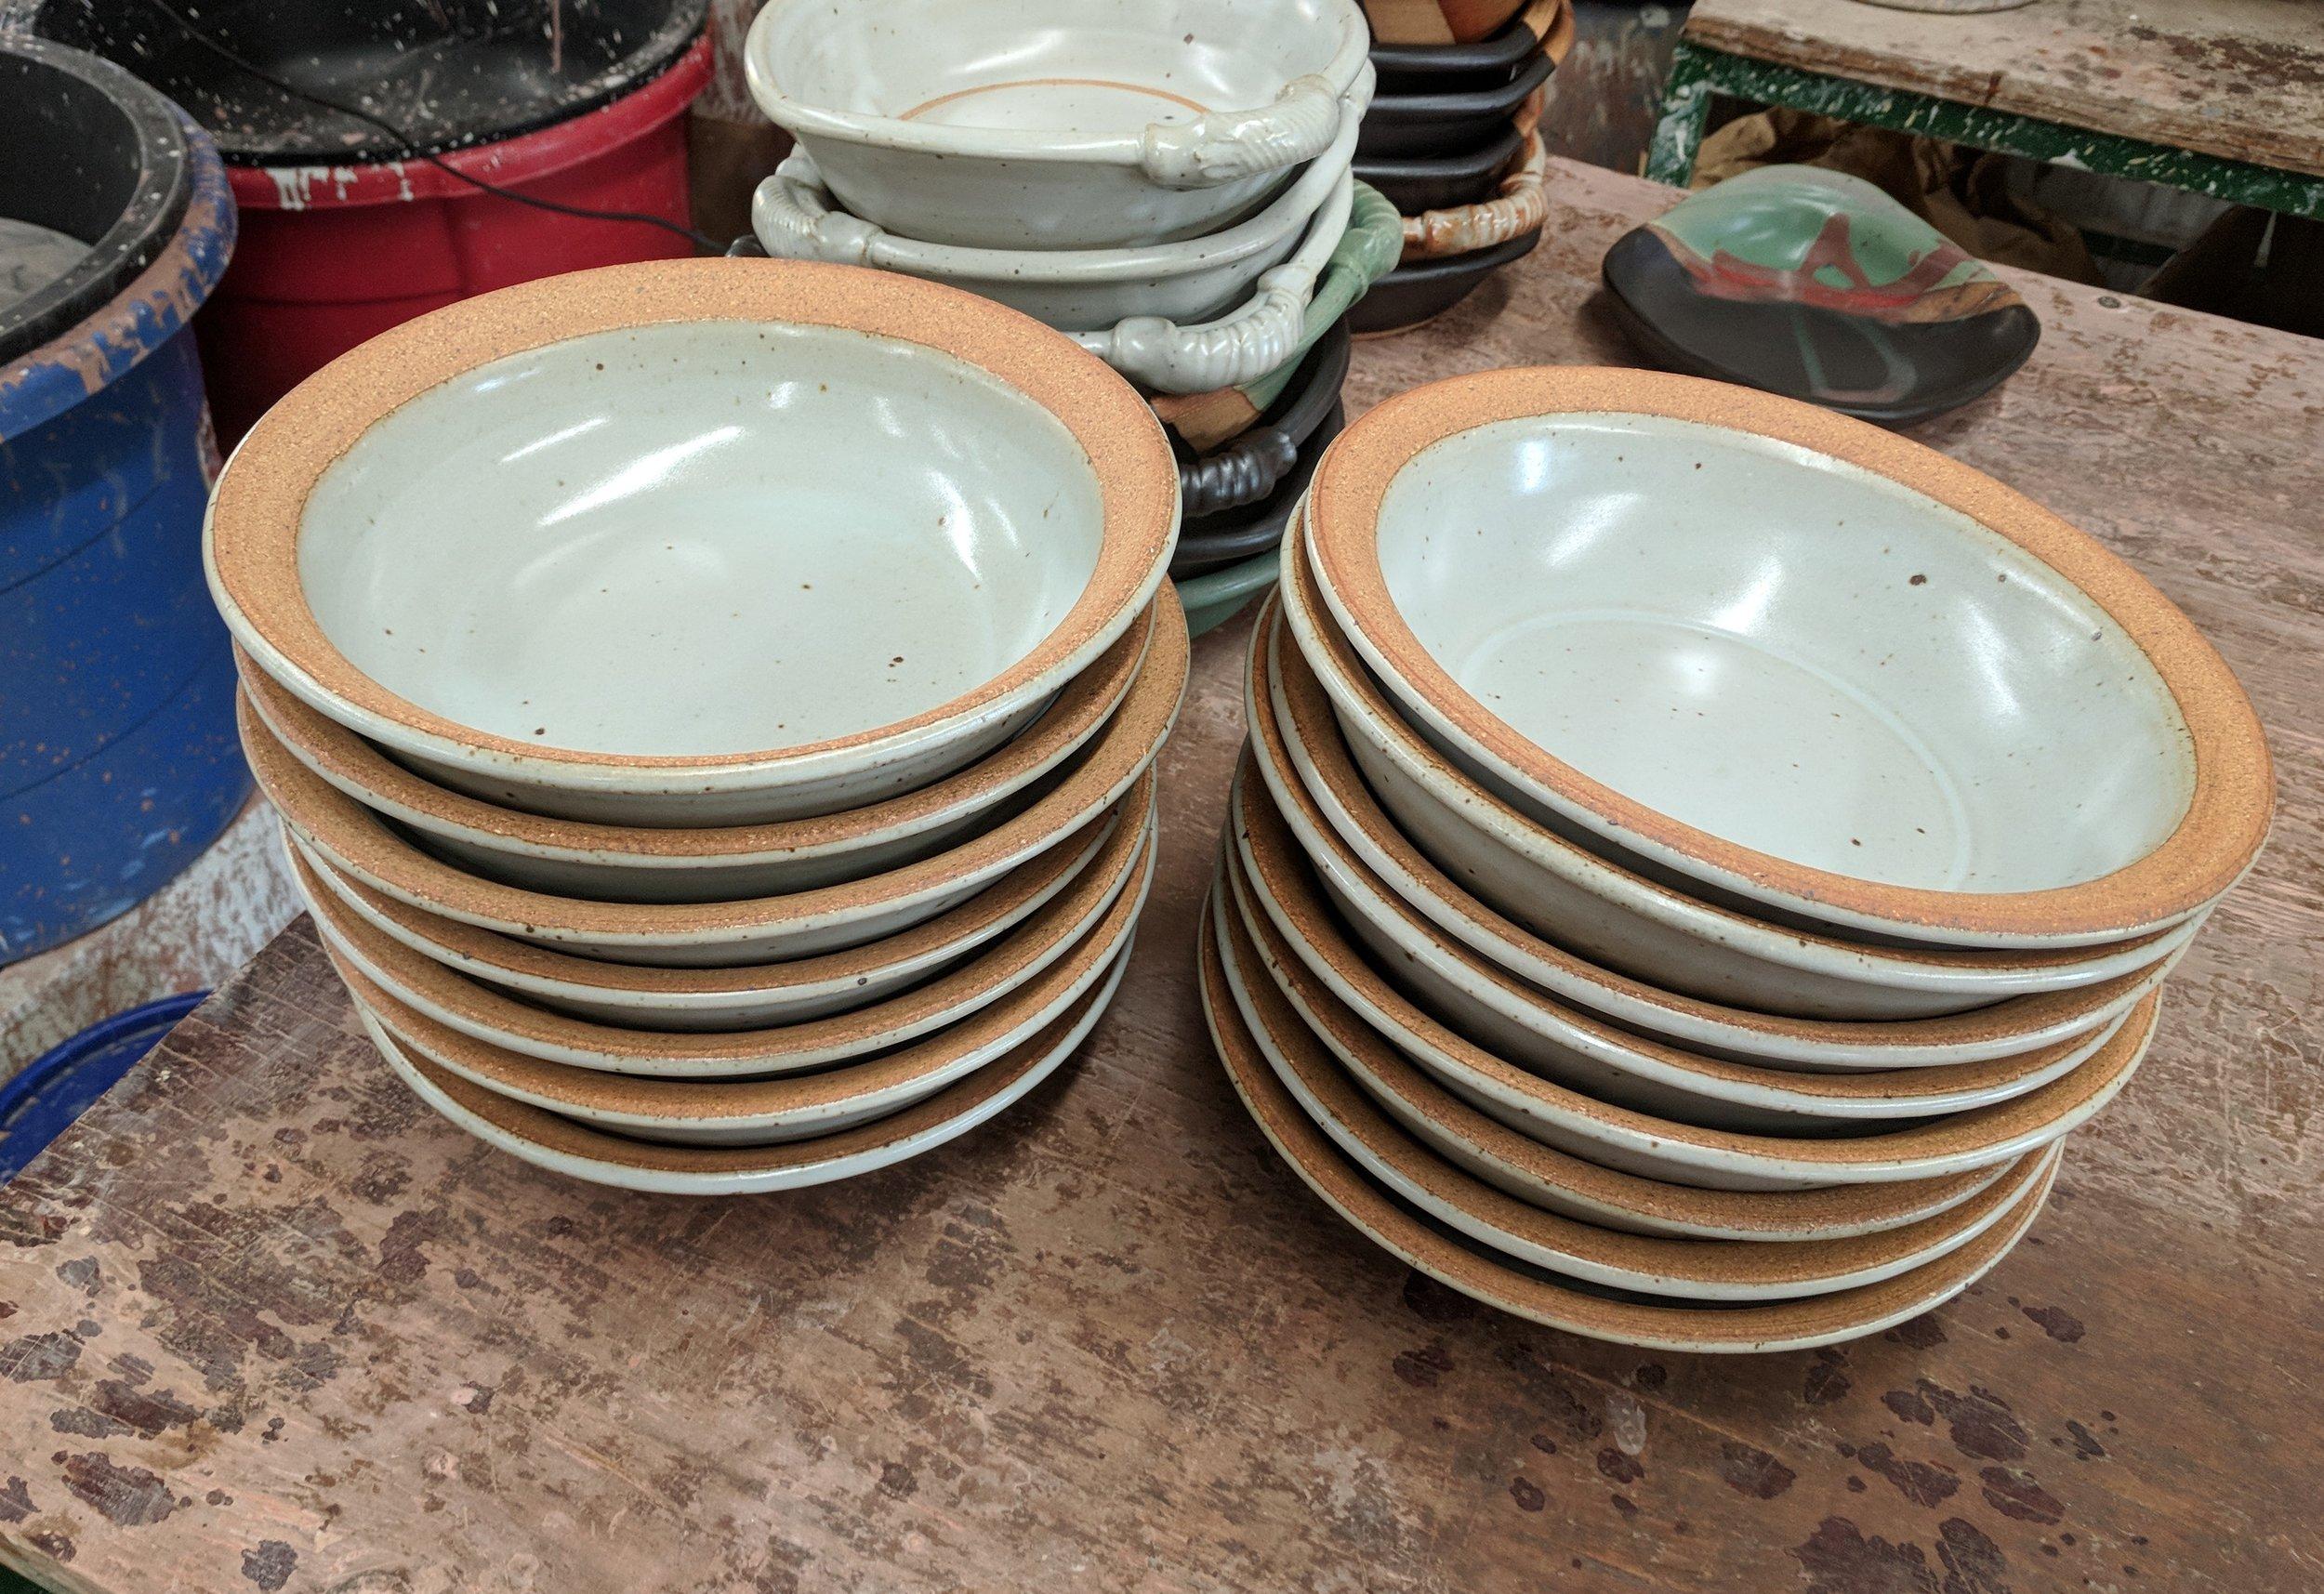 larger than usual pasta/soup/salad bowls